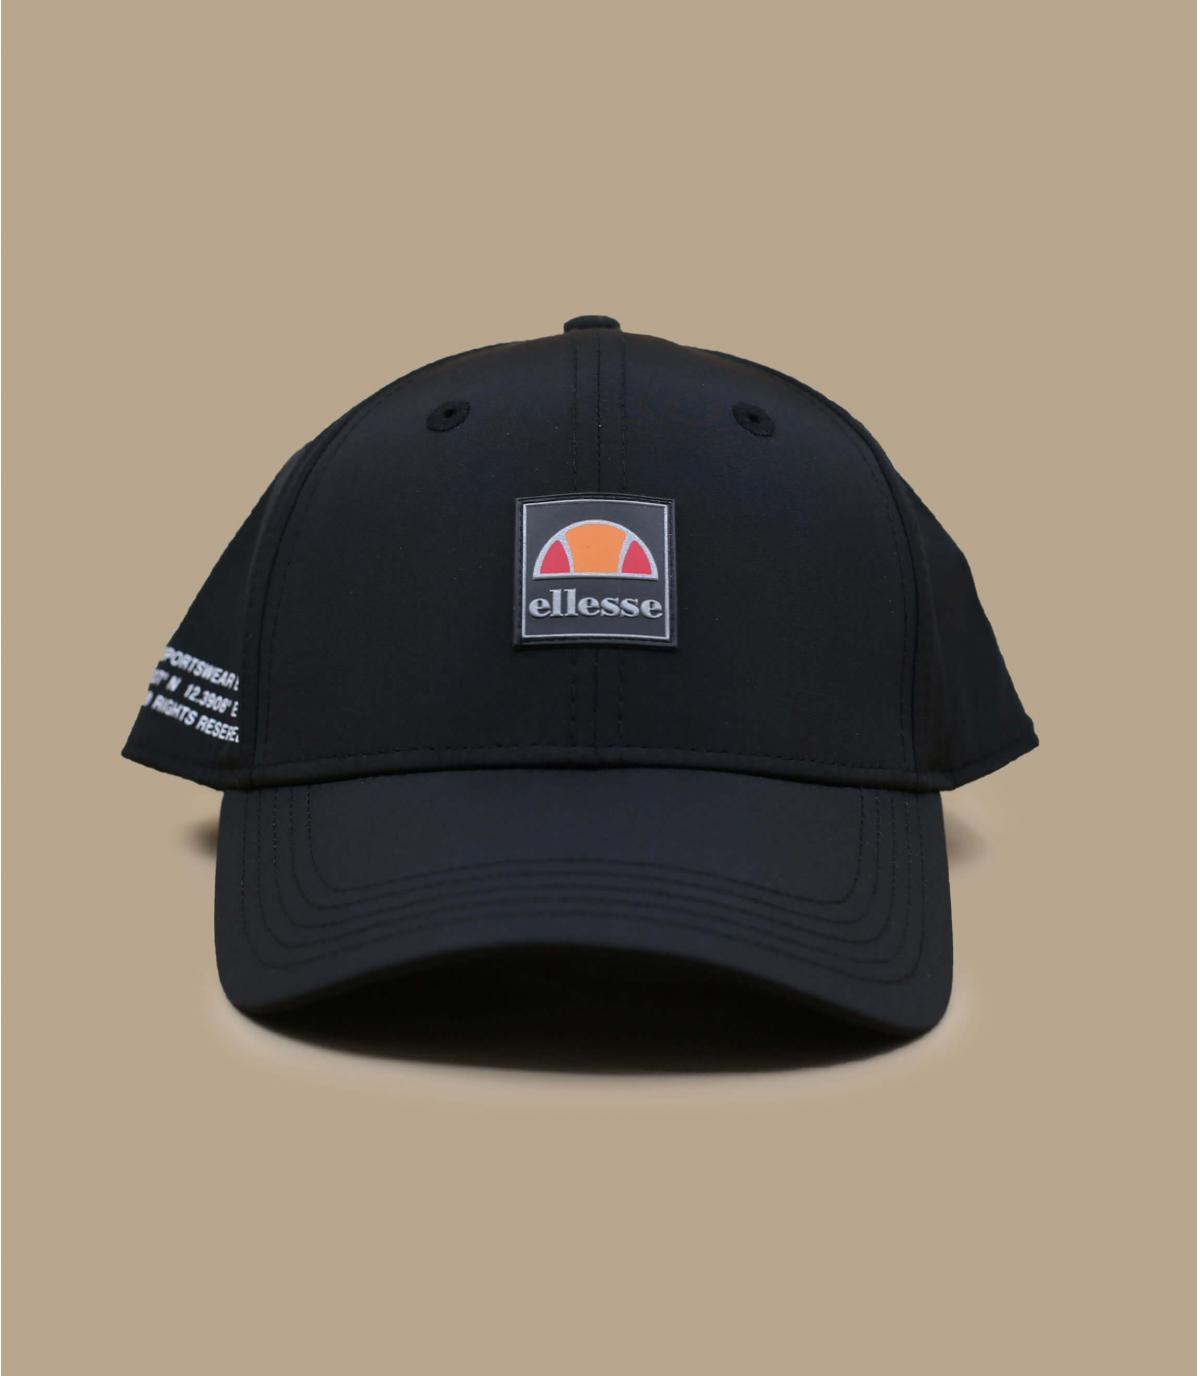 gorra Ellesse negra